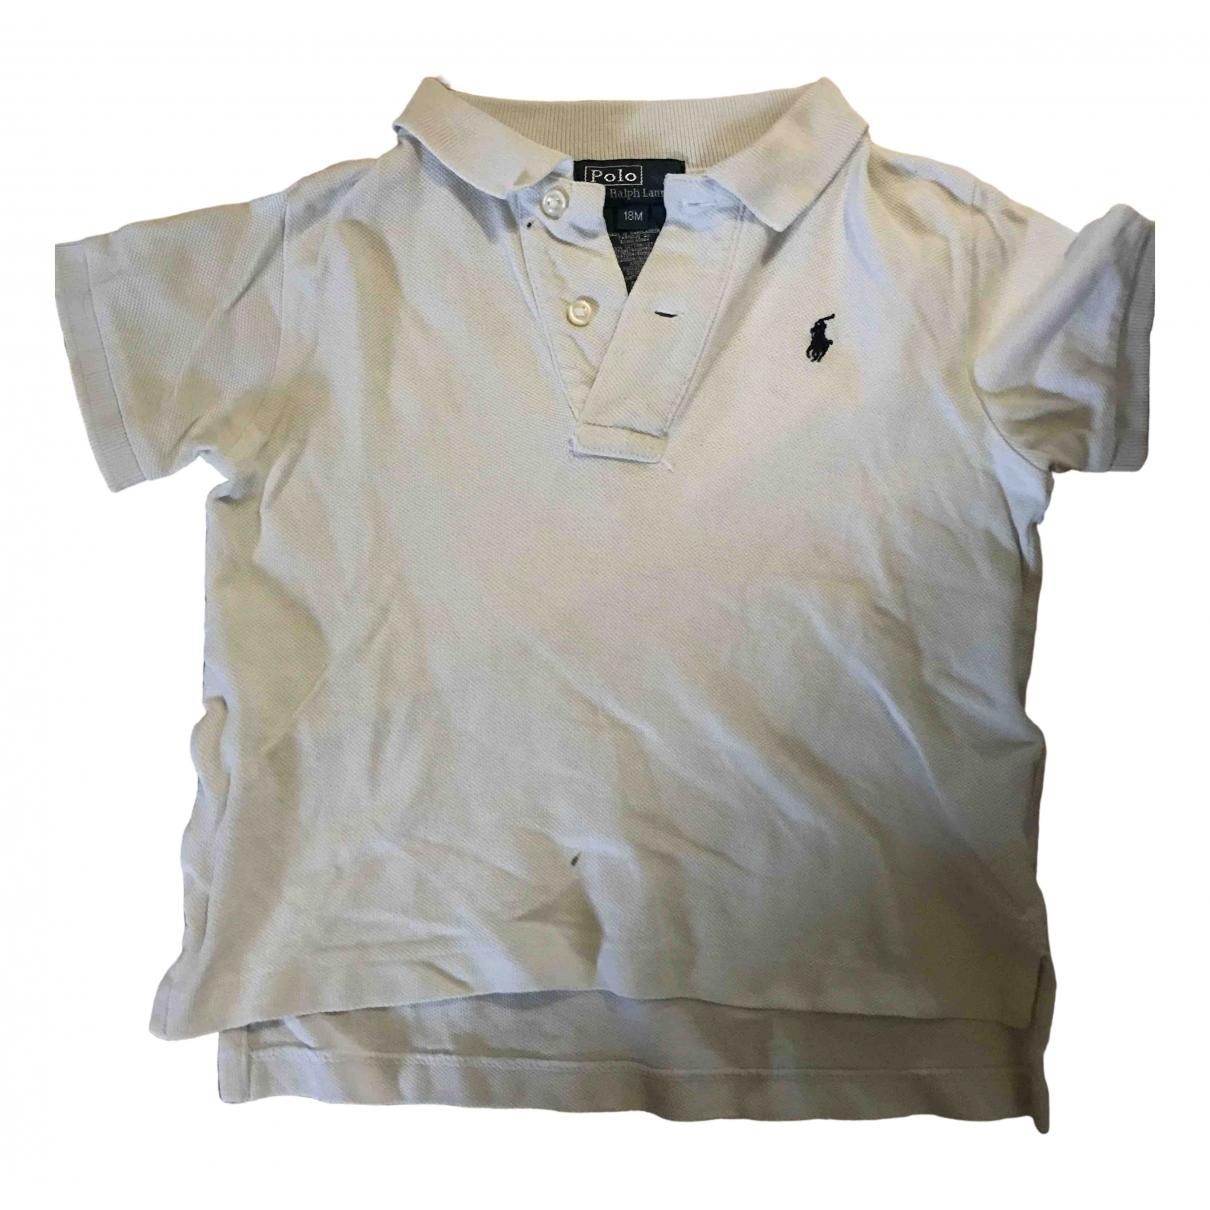 Camisetas en Algodon Blanco Polo Ralph Lauren